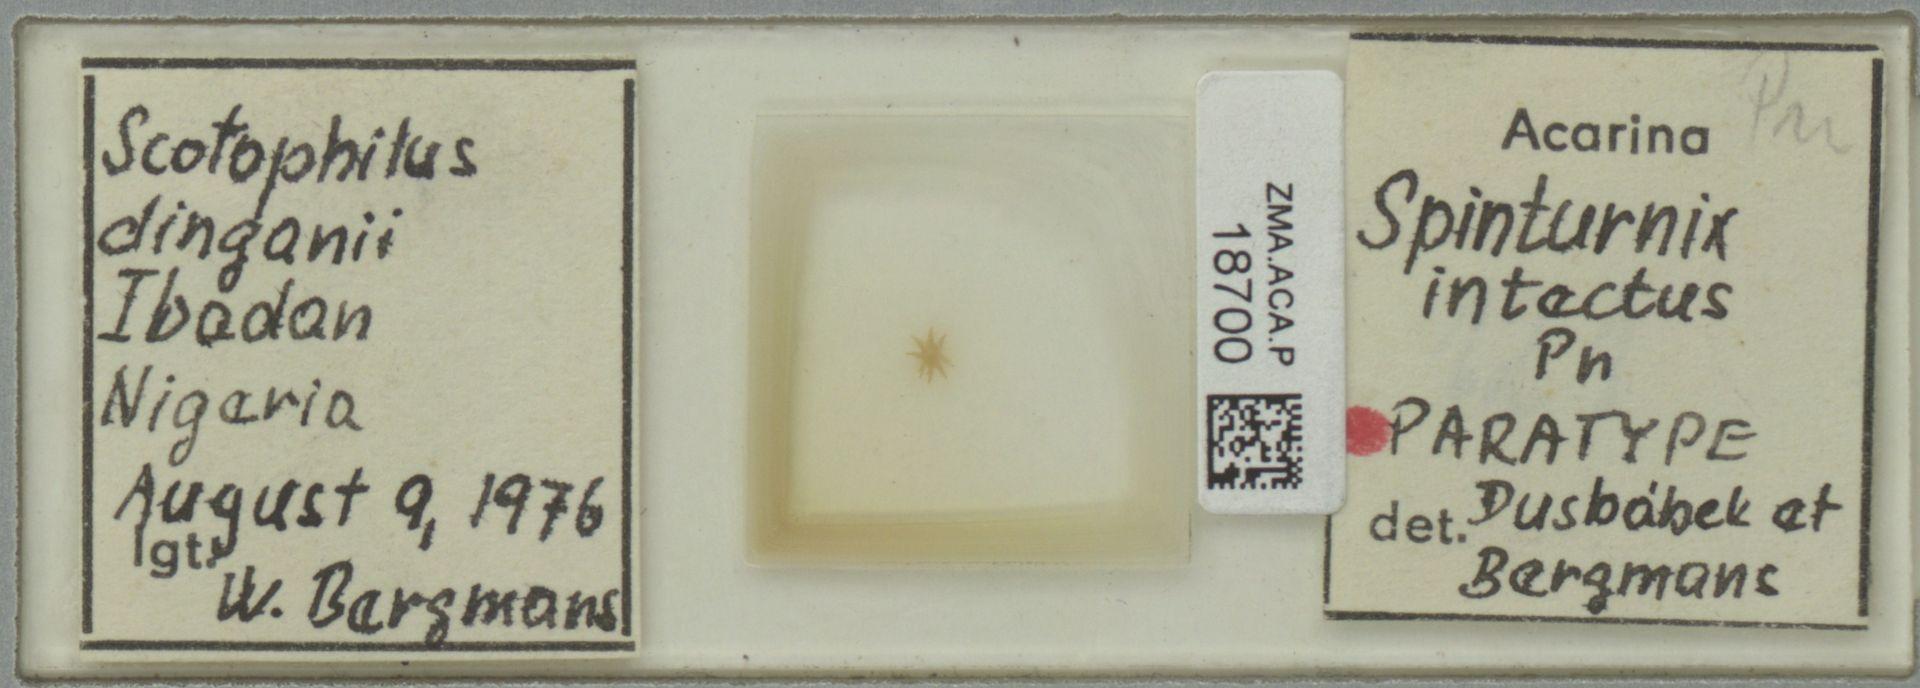 ZMA.ACA.P.18700 | Spinturnix intectus